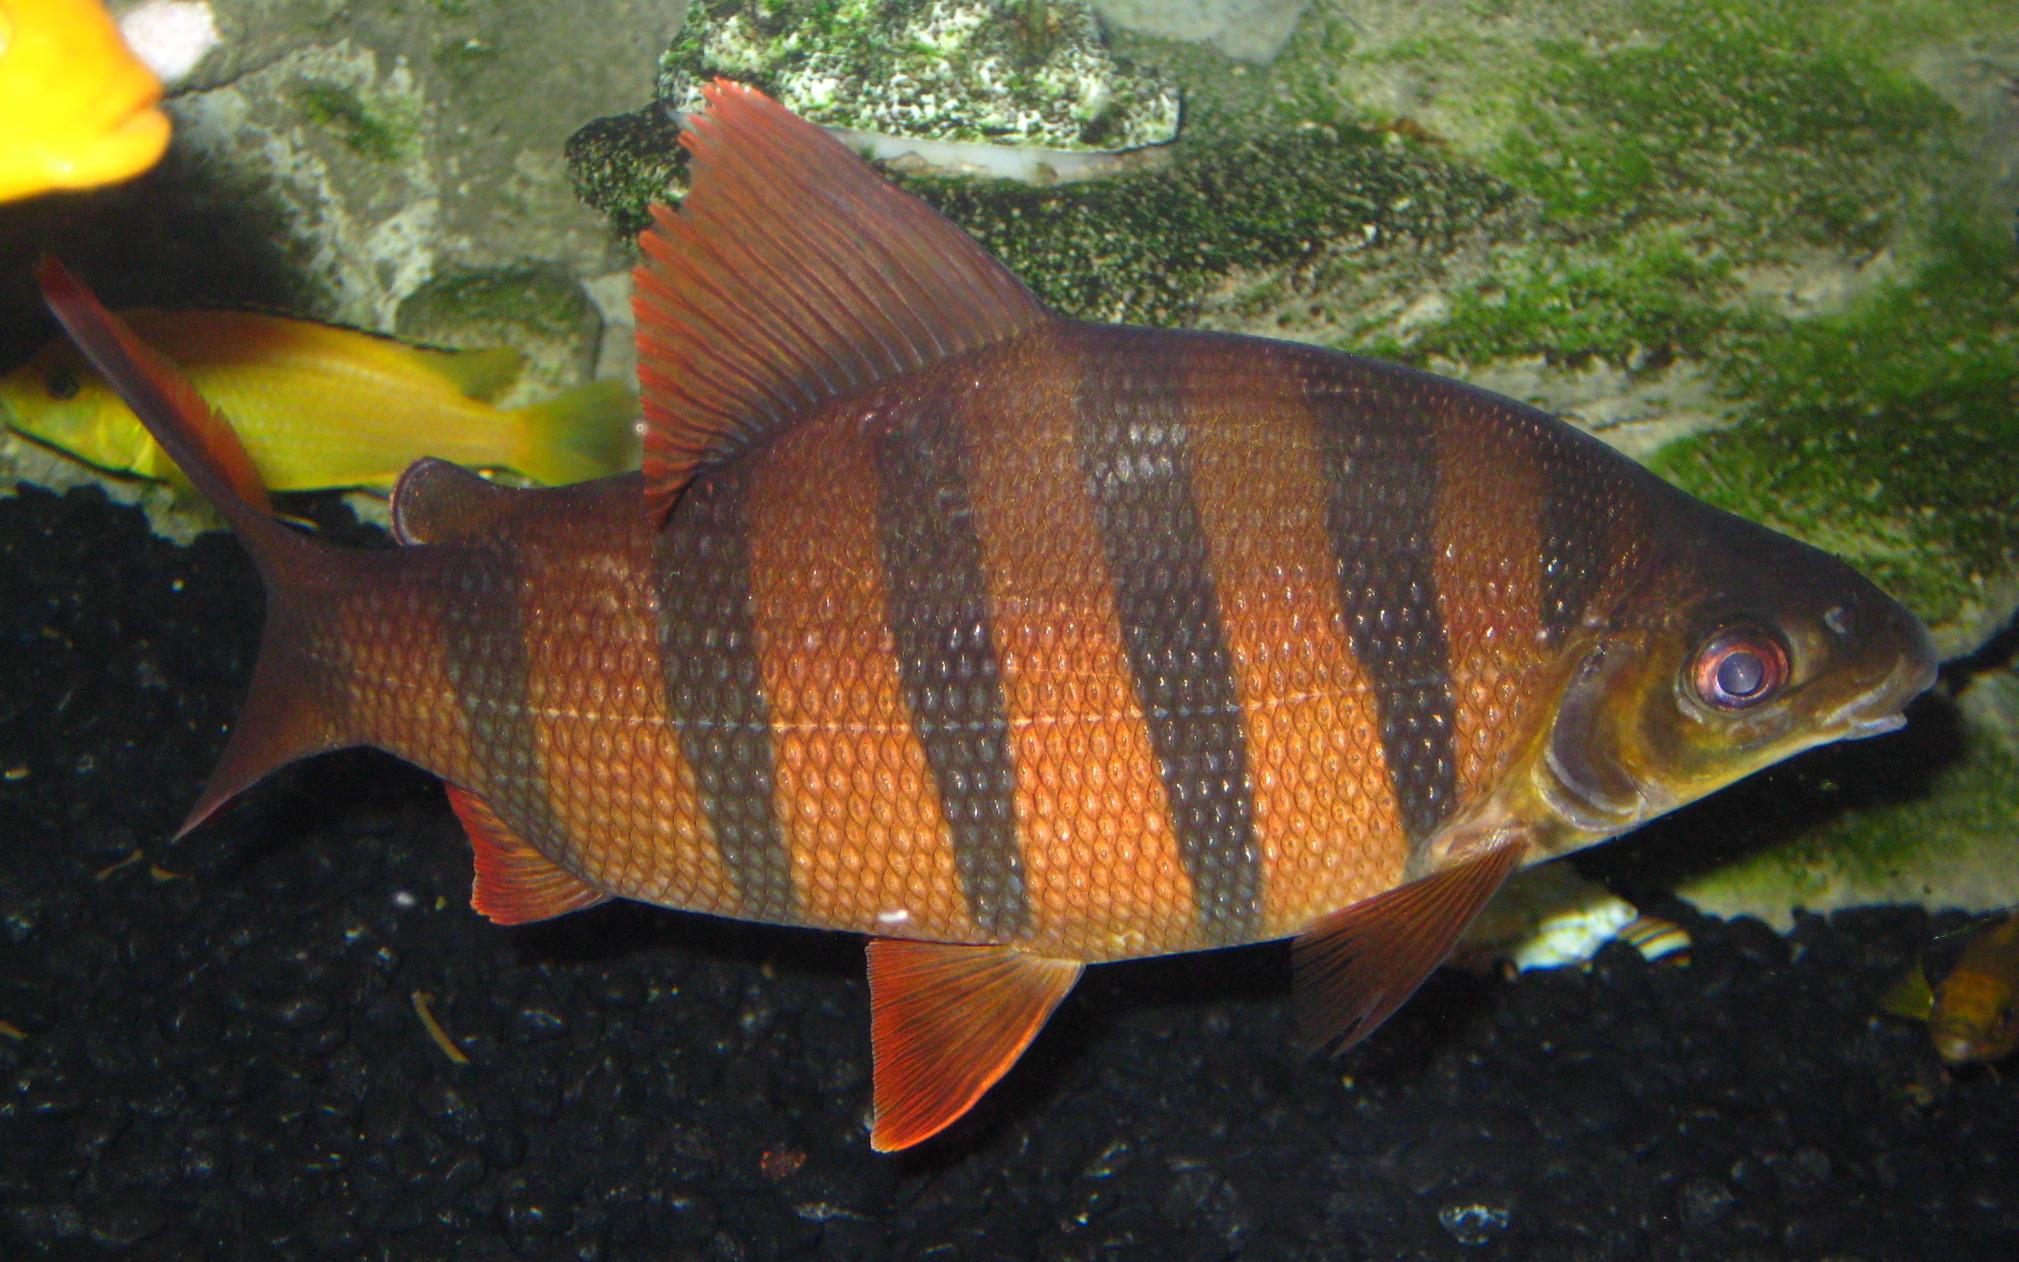 cichlids.com: distichodus Sexfasciatus